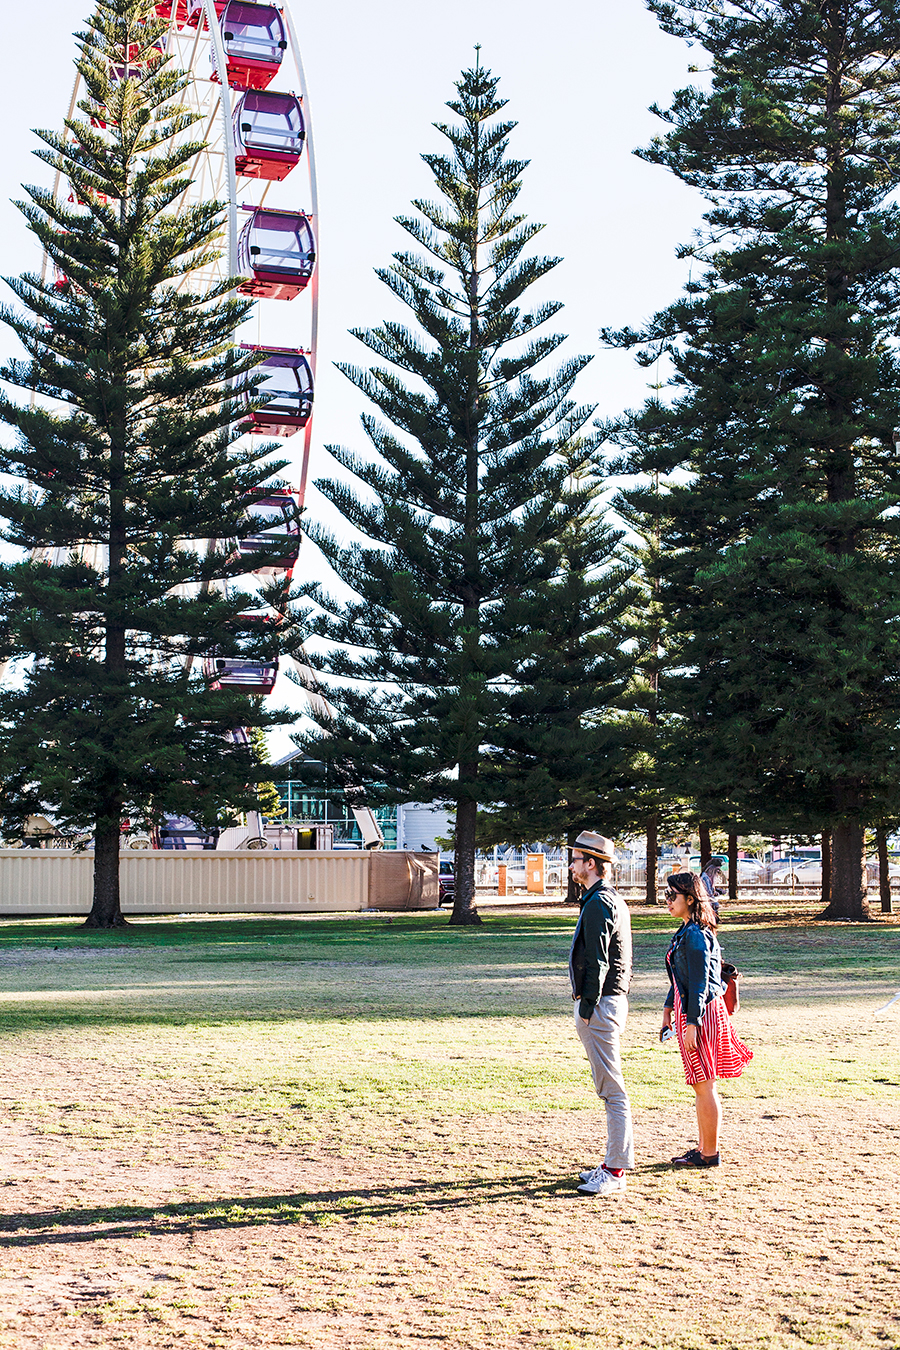 Artistic photo in front of a ferris wheel in Fremantle Perth Australia.